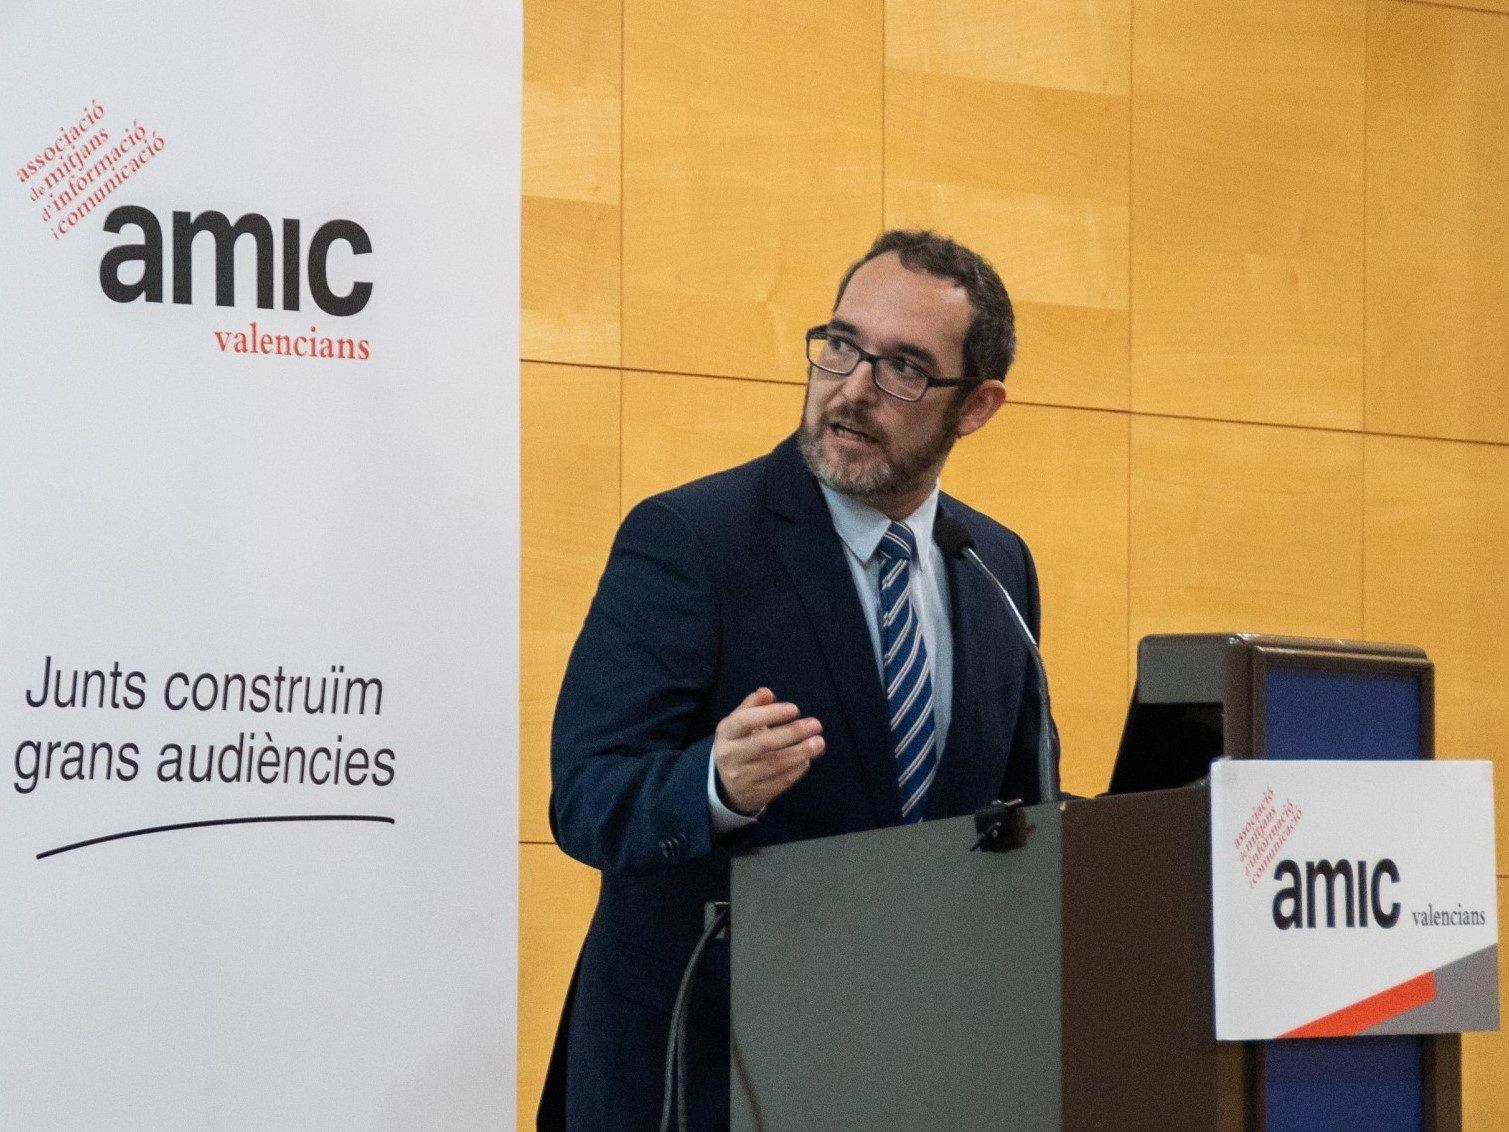 AMIC Ramon Grau, president de l'AMIC valencians agencia prensa2 carlos bueno moisés castell